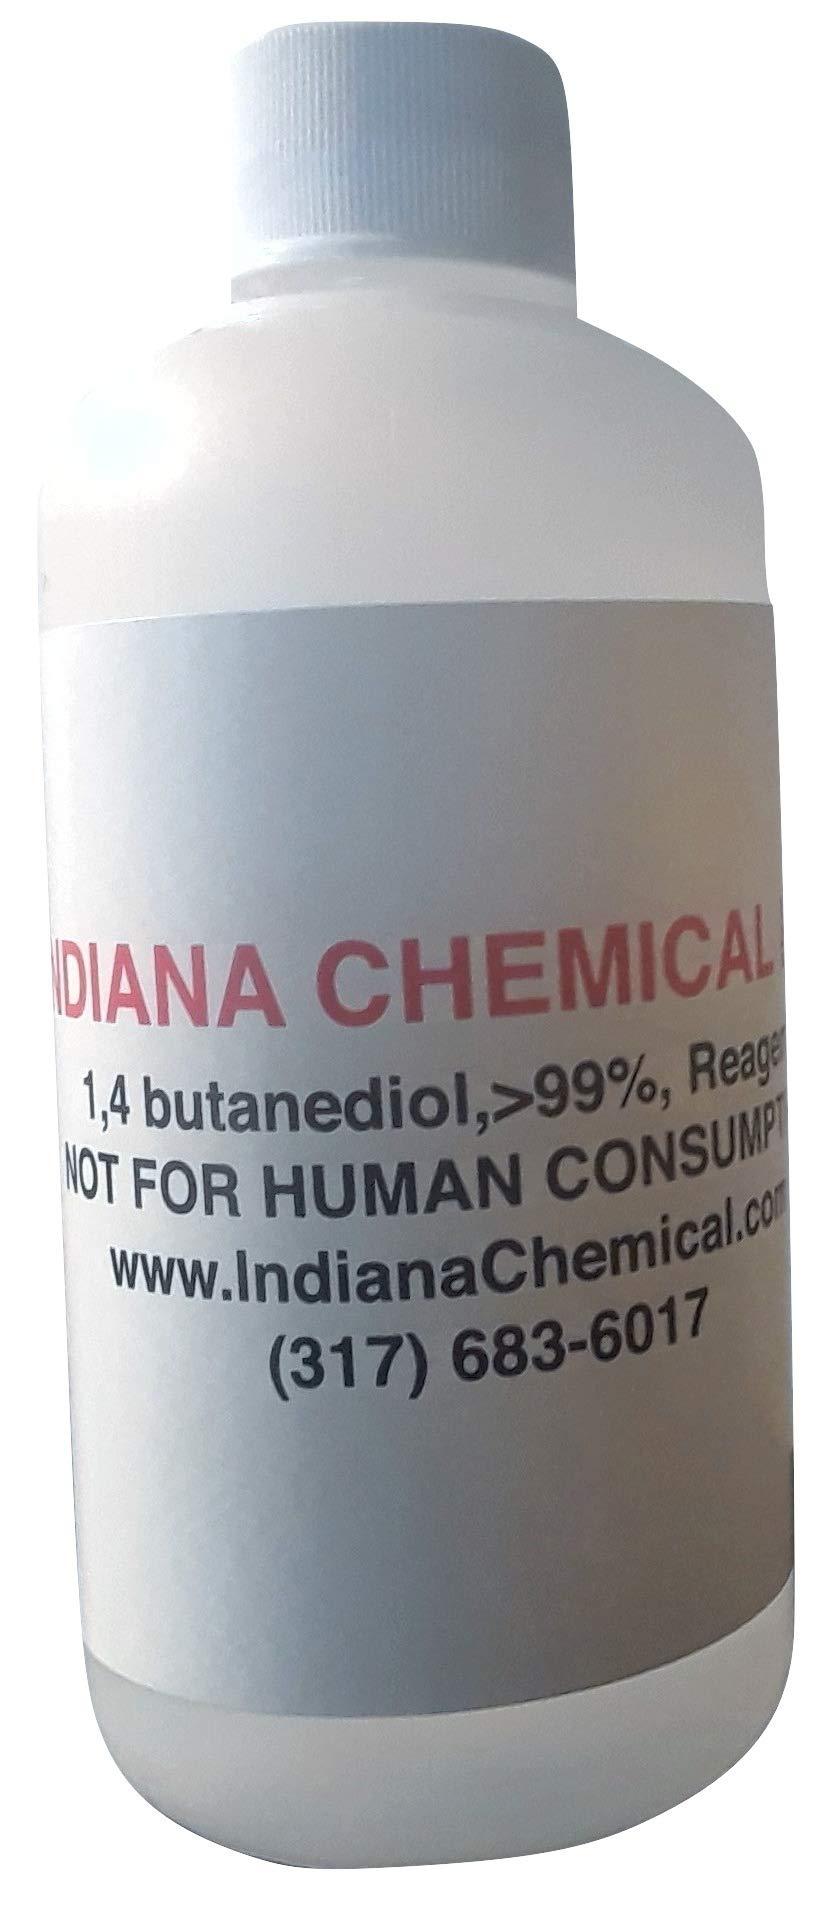 8oz 1,4 butanediol